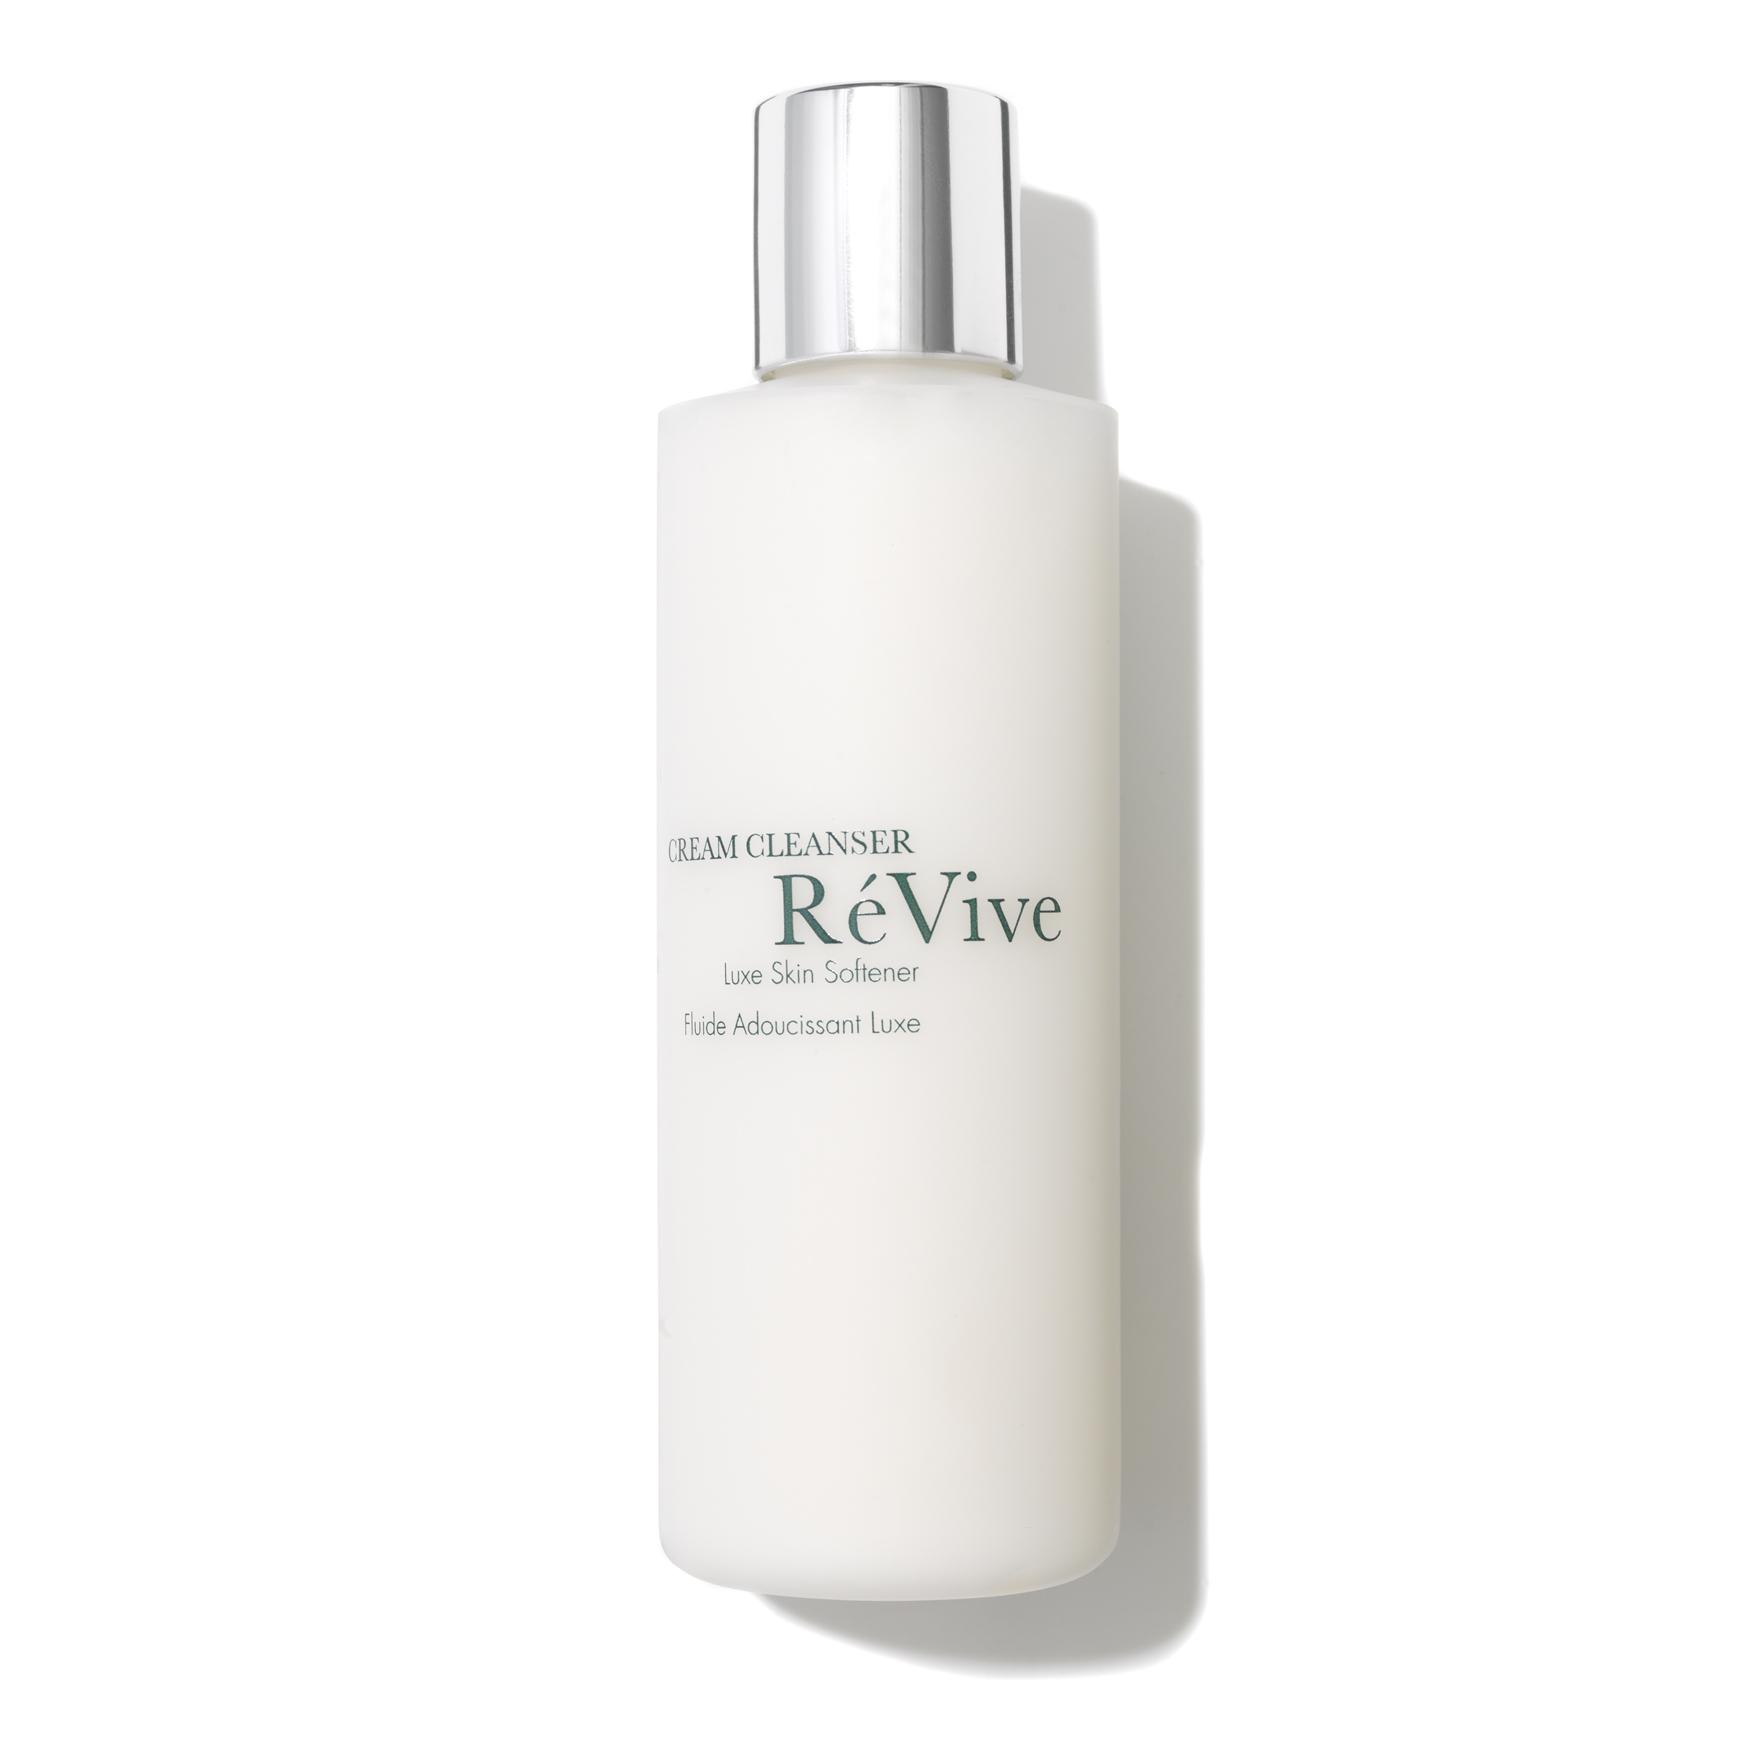 Révive Cream Cleanser Luxe Skin Softener